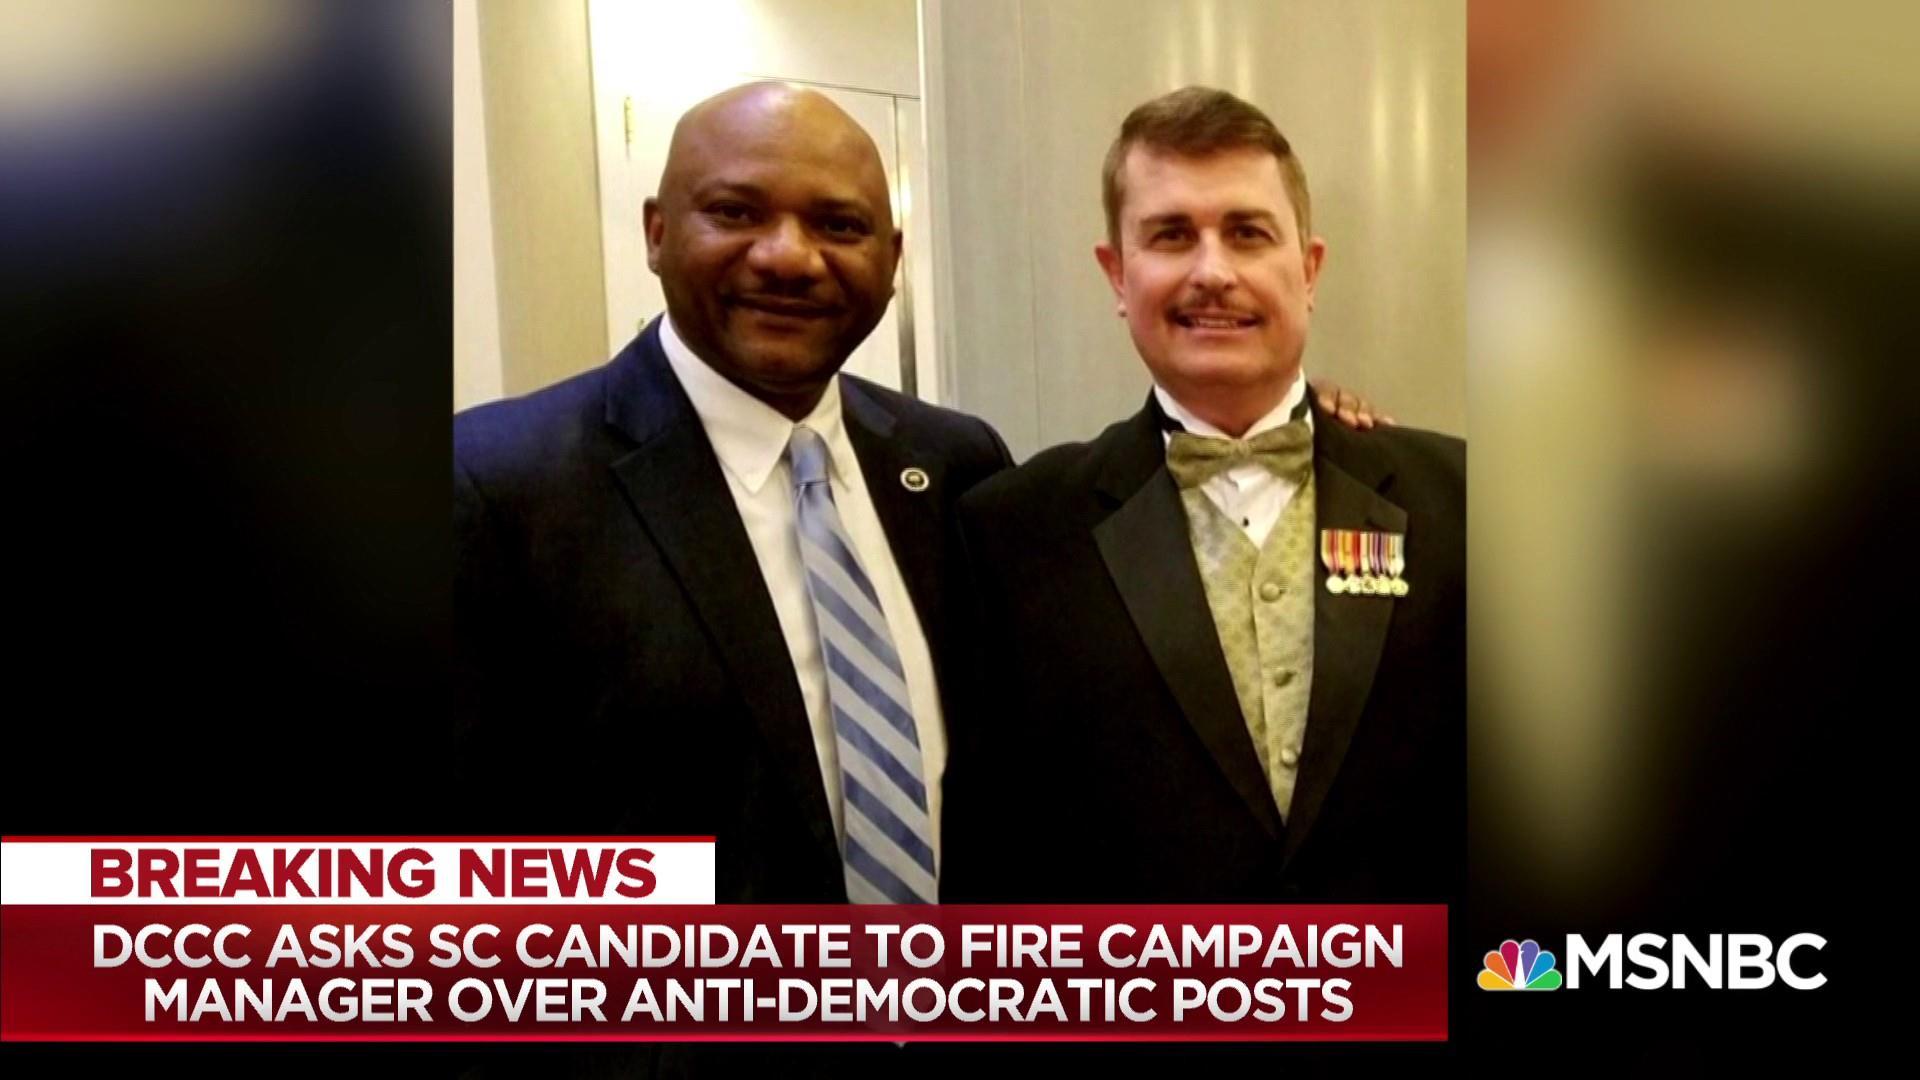 Democrat's campaign chief draws party ire for Facebook attacks